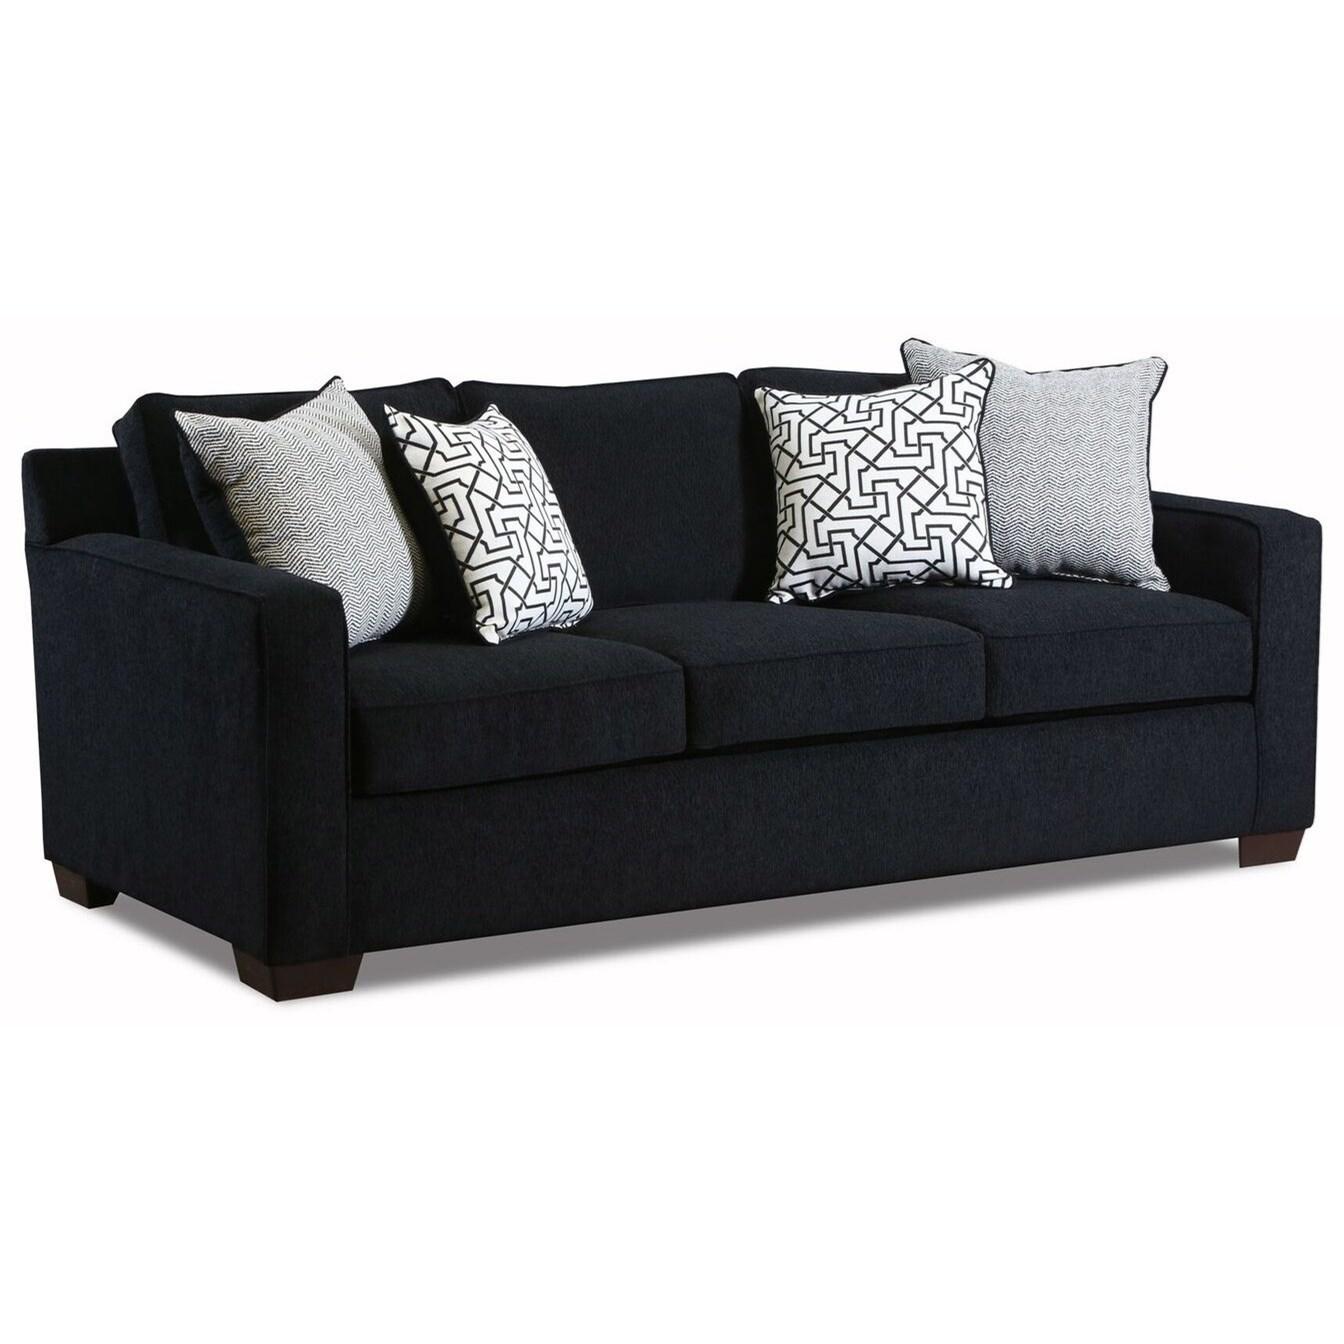 4050 Sofa by Peak Living at Prime Brothers Furniture